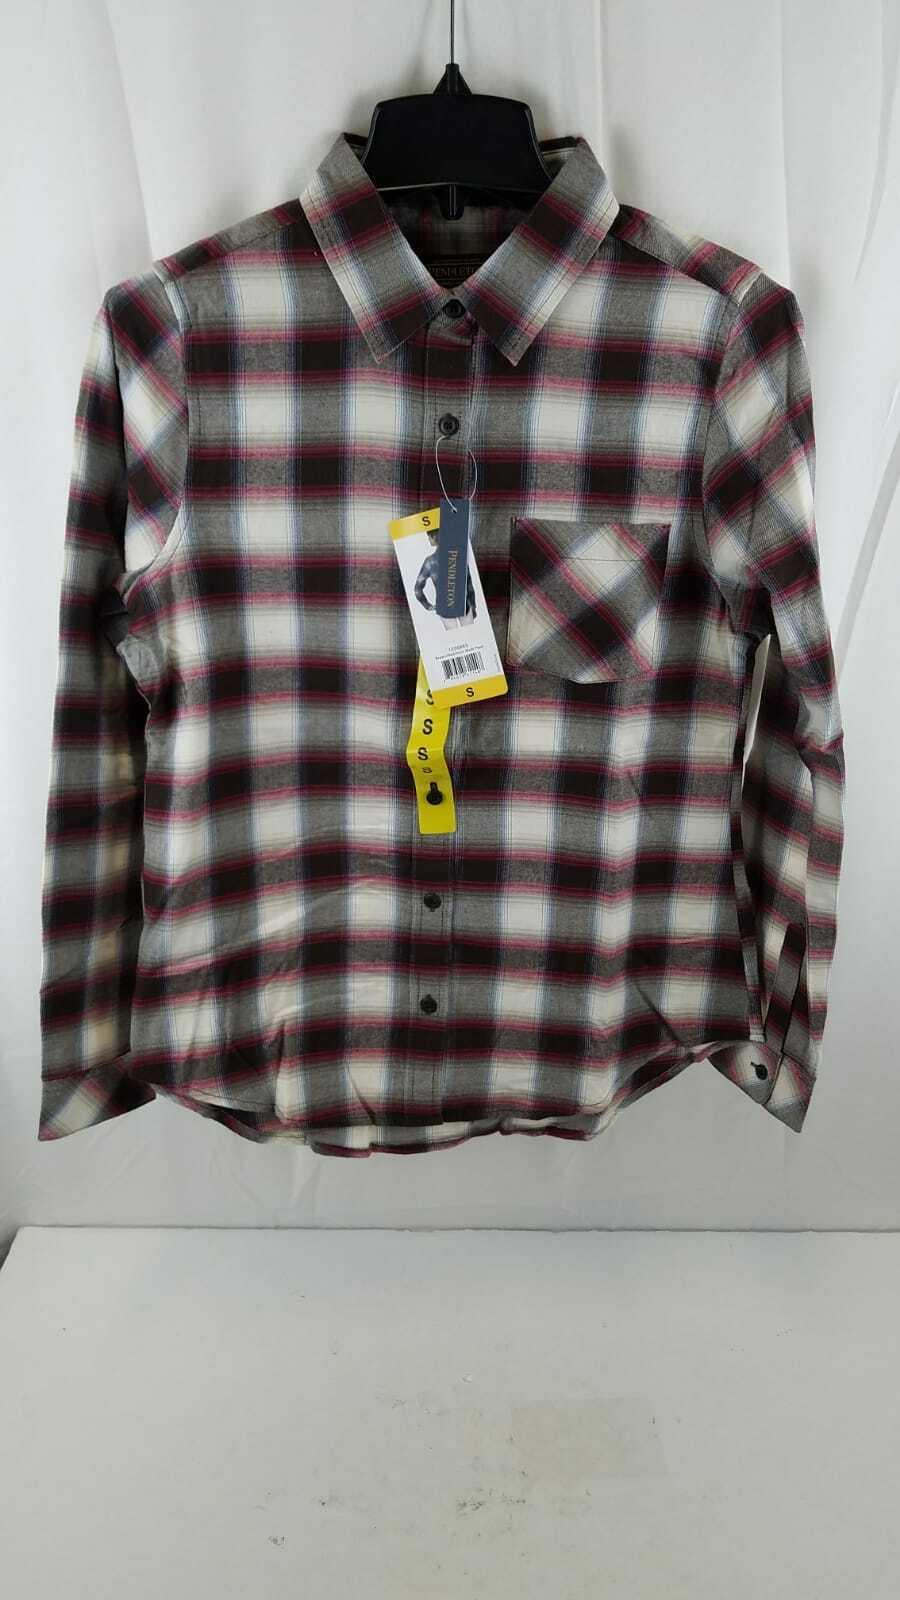 Pendleton Women's Frankie Flannel Long Sleeve Shirt Brown/Re